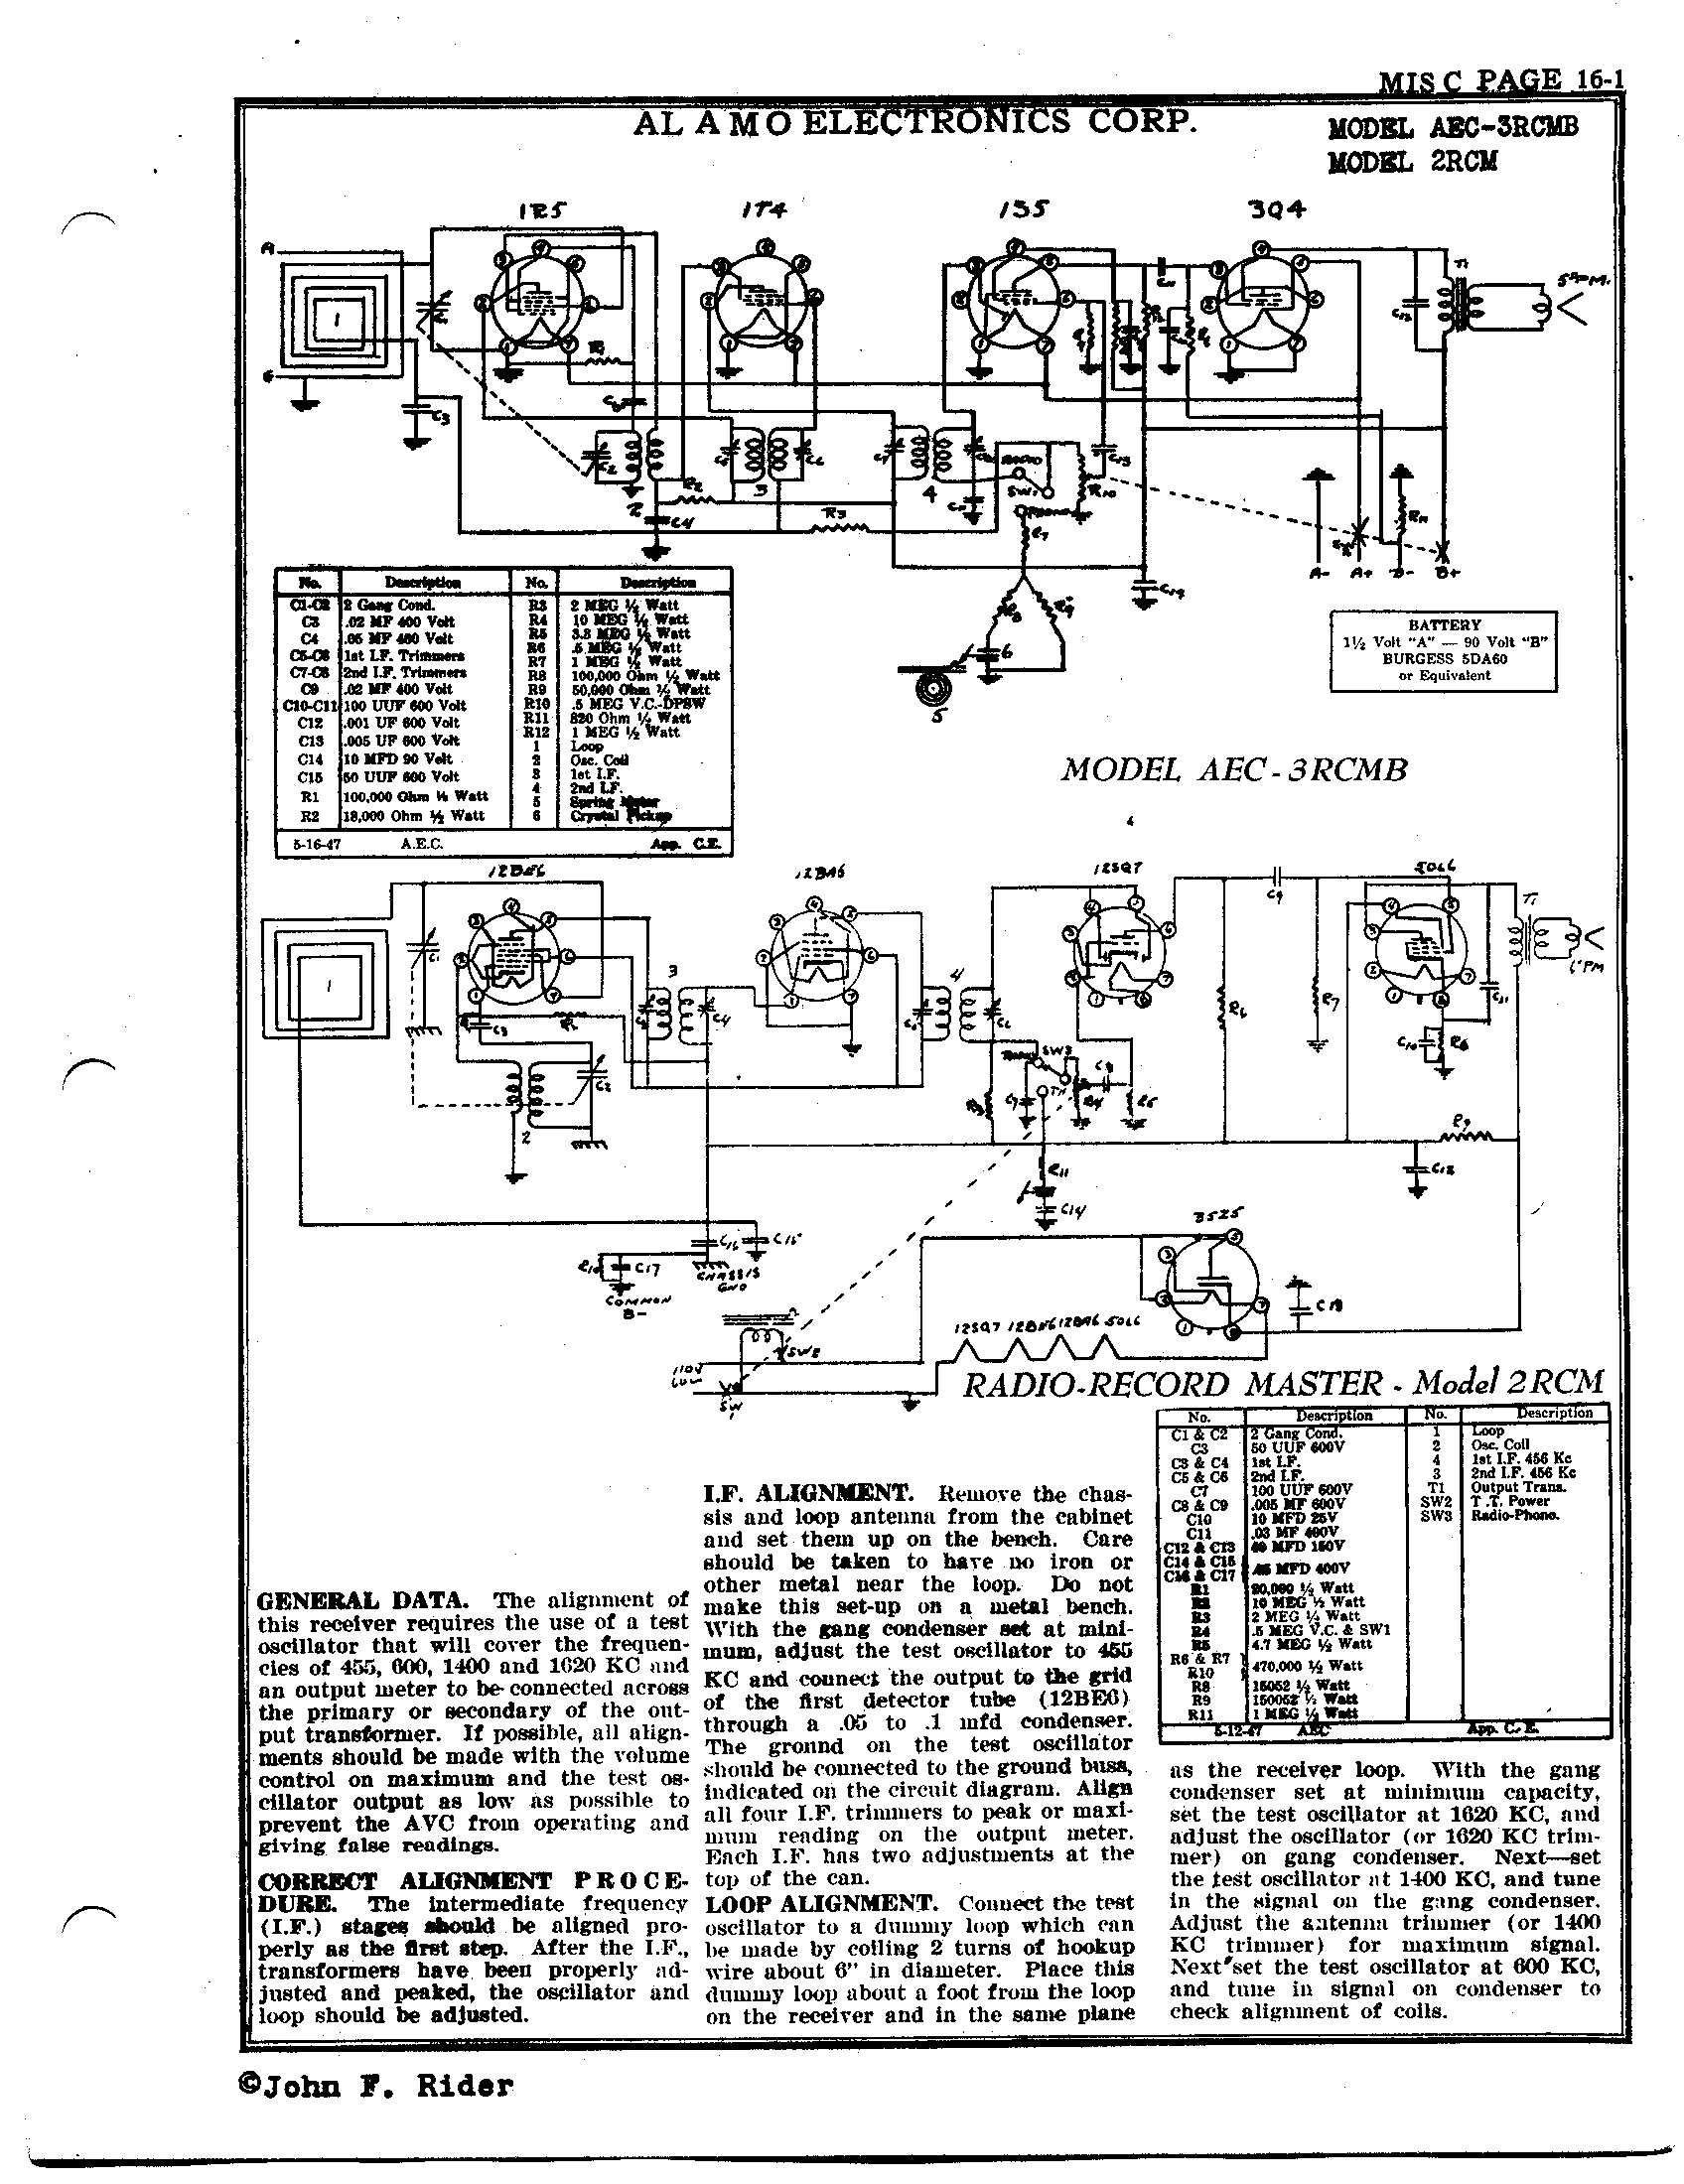 [DIAGRAM_5LK]  Alamo Electronics Corp. 2RCM | Antique Electronic Supply | Alamo Amp Schematics |  | Antique Electronic Supply